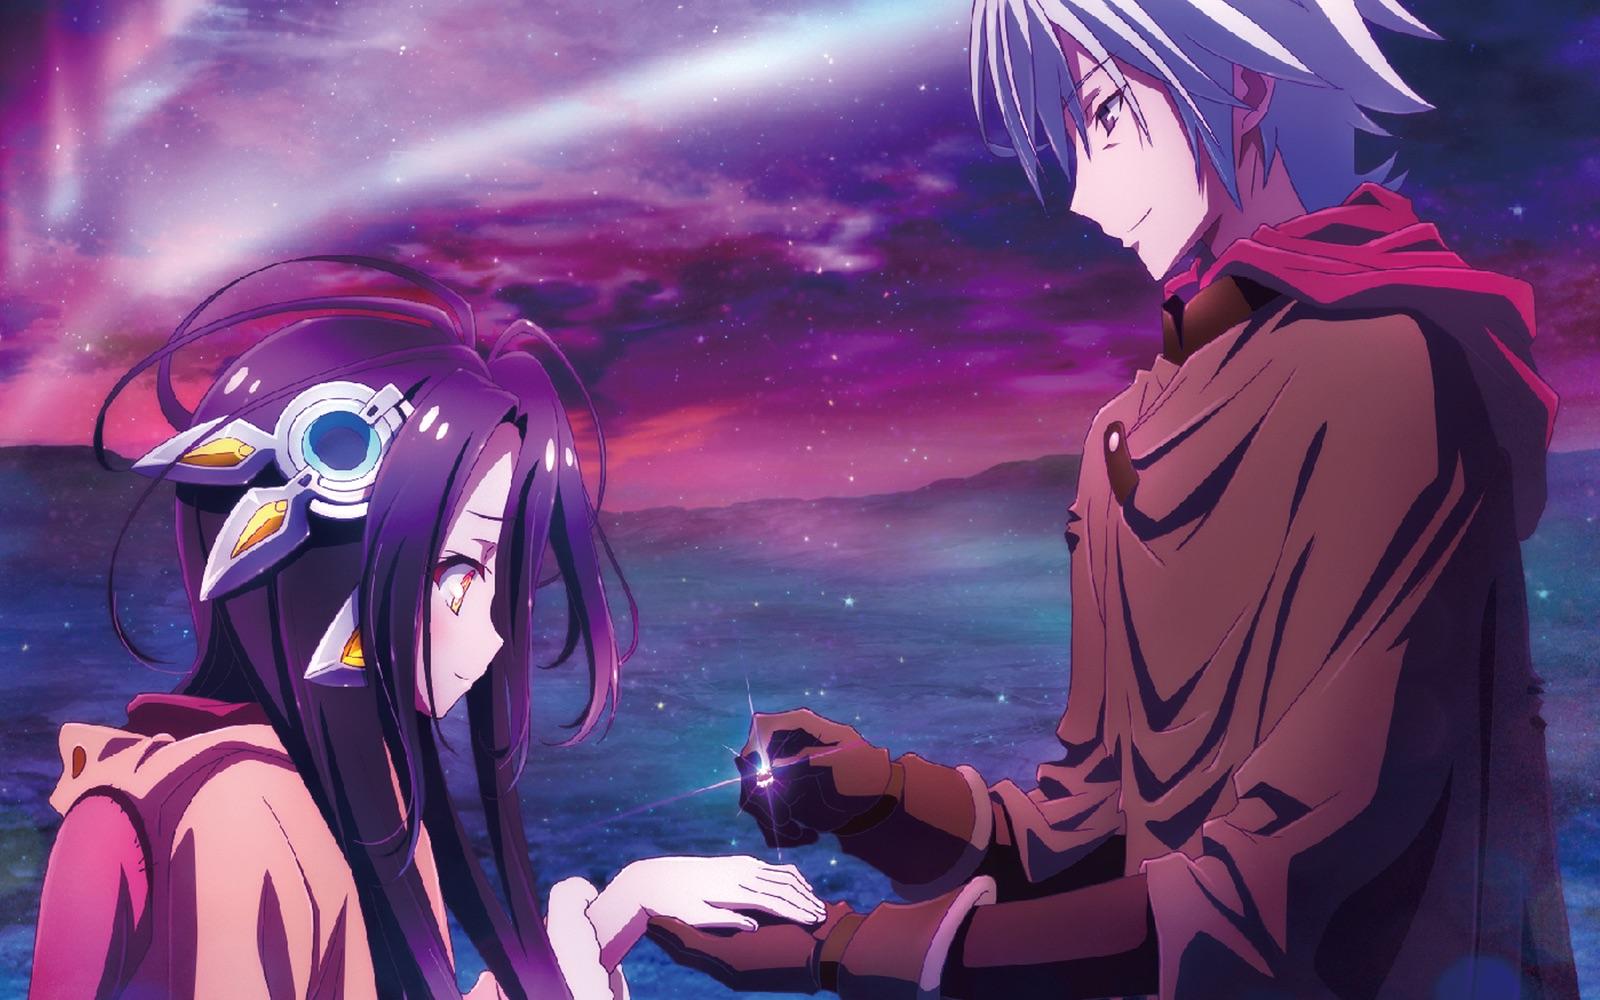 Wallpaper 3d Anime 【无损ost】游戏人生剧场版最感人音乐!完整版 哔哩哔哩 ゜ ゜ つロ 干杯 Bilibili